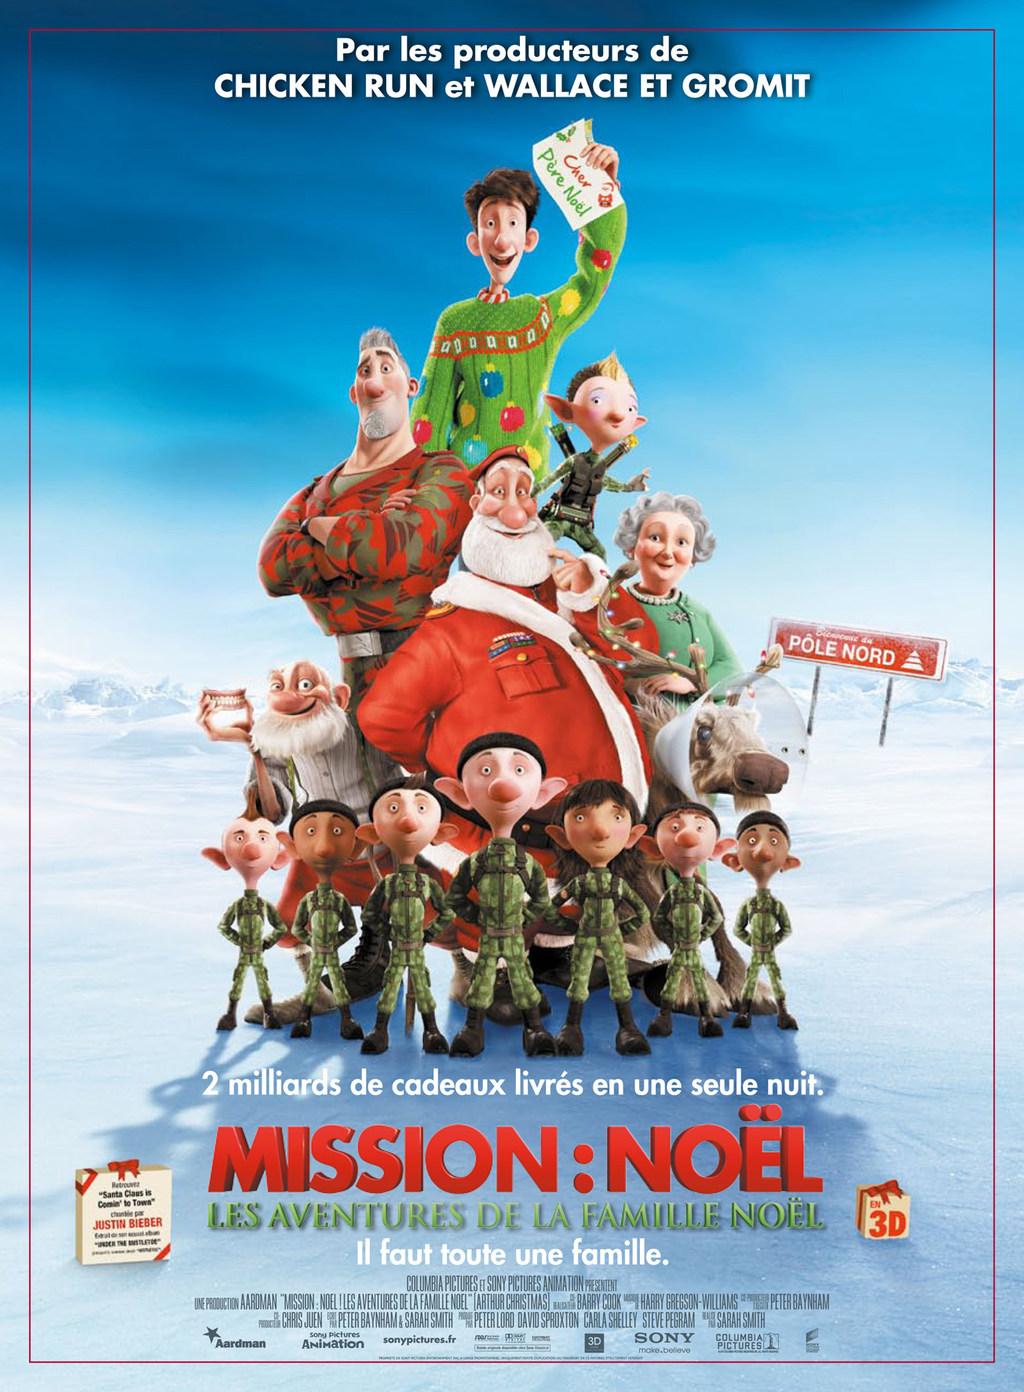 MISSION+NOEL